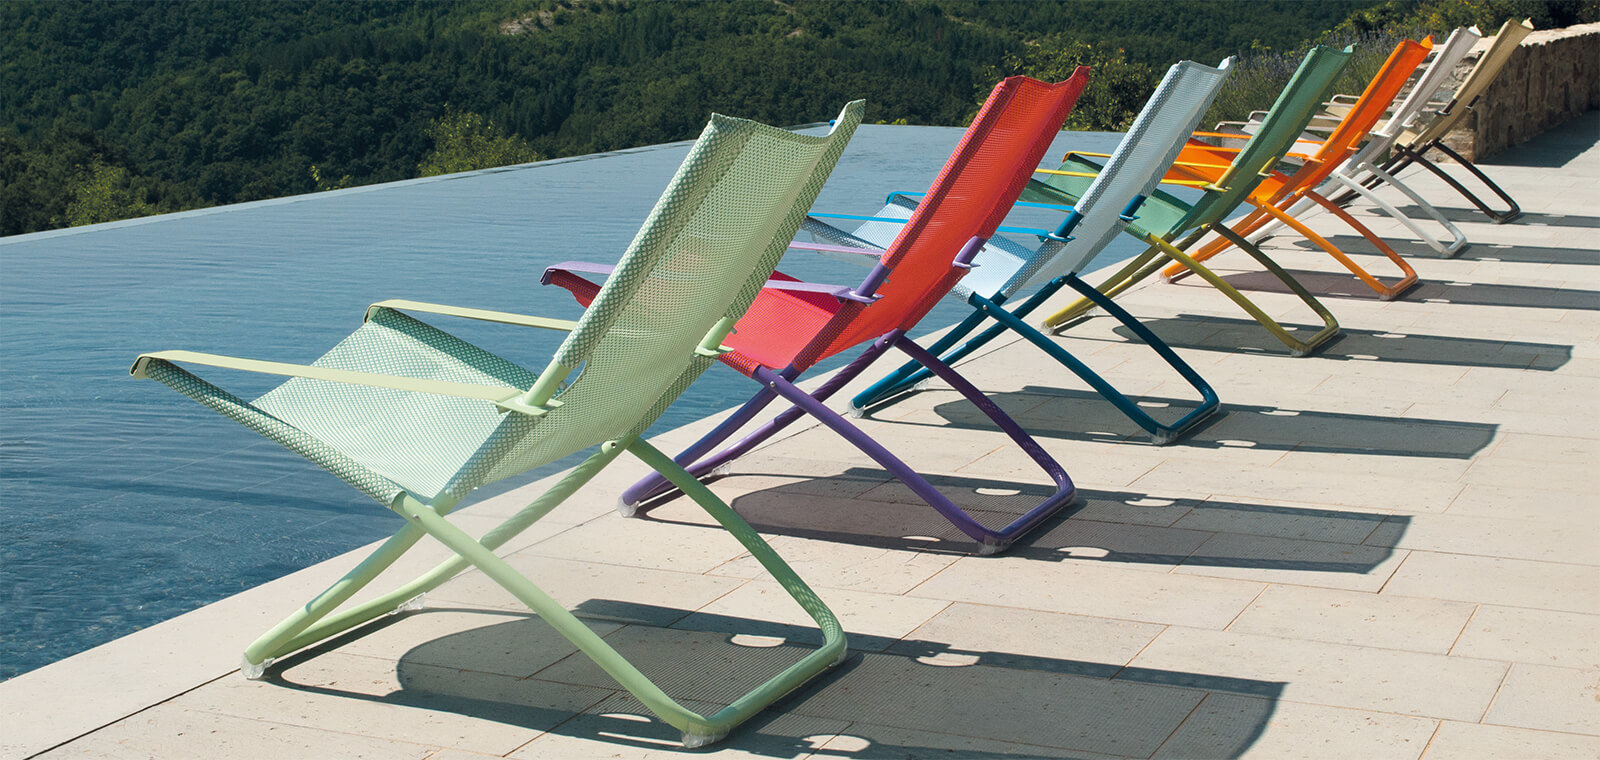 Awesome Decoration Jardin Ottignies Ideas - Yourmentor.info ...